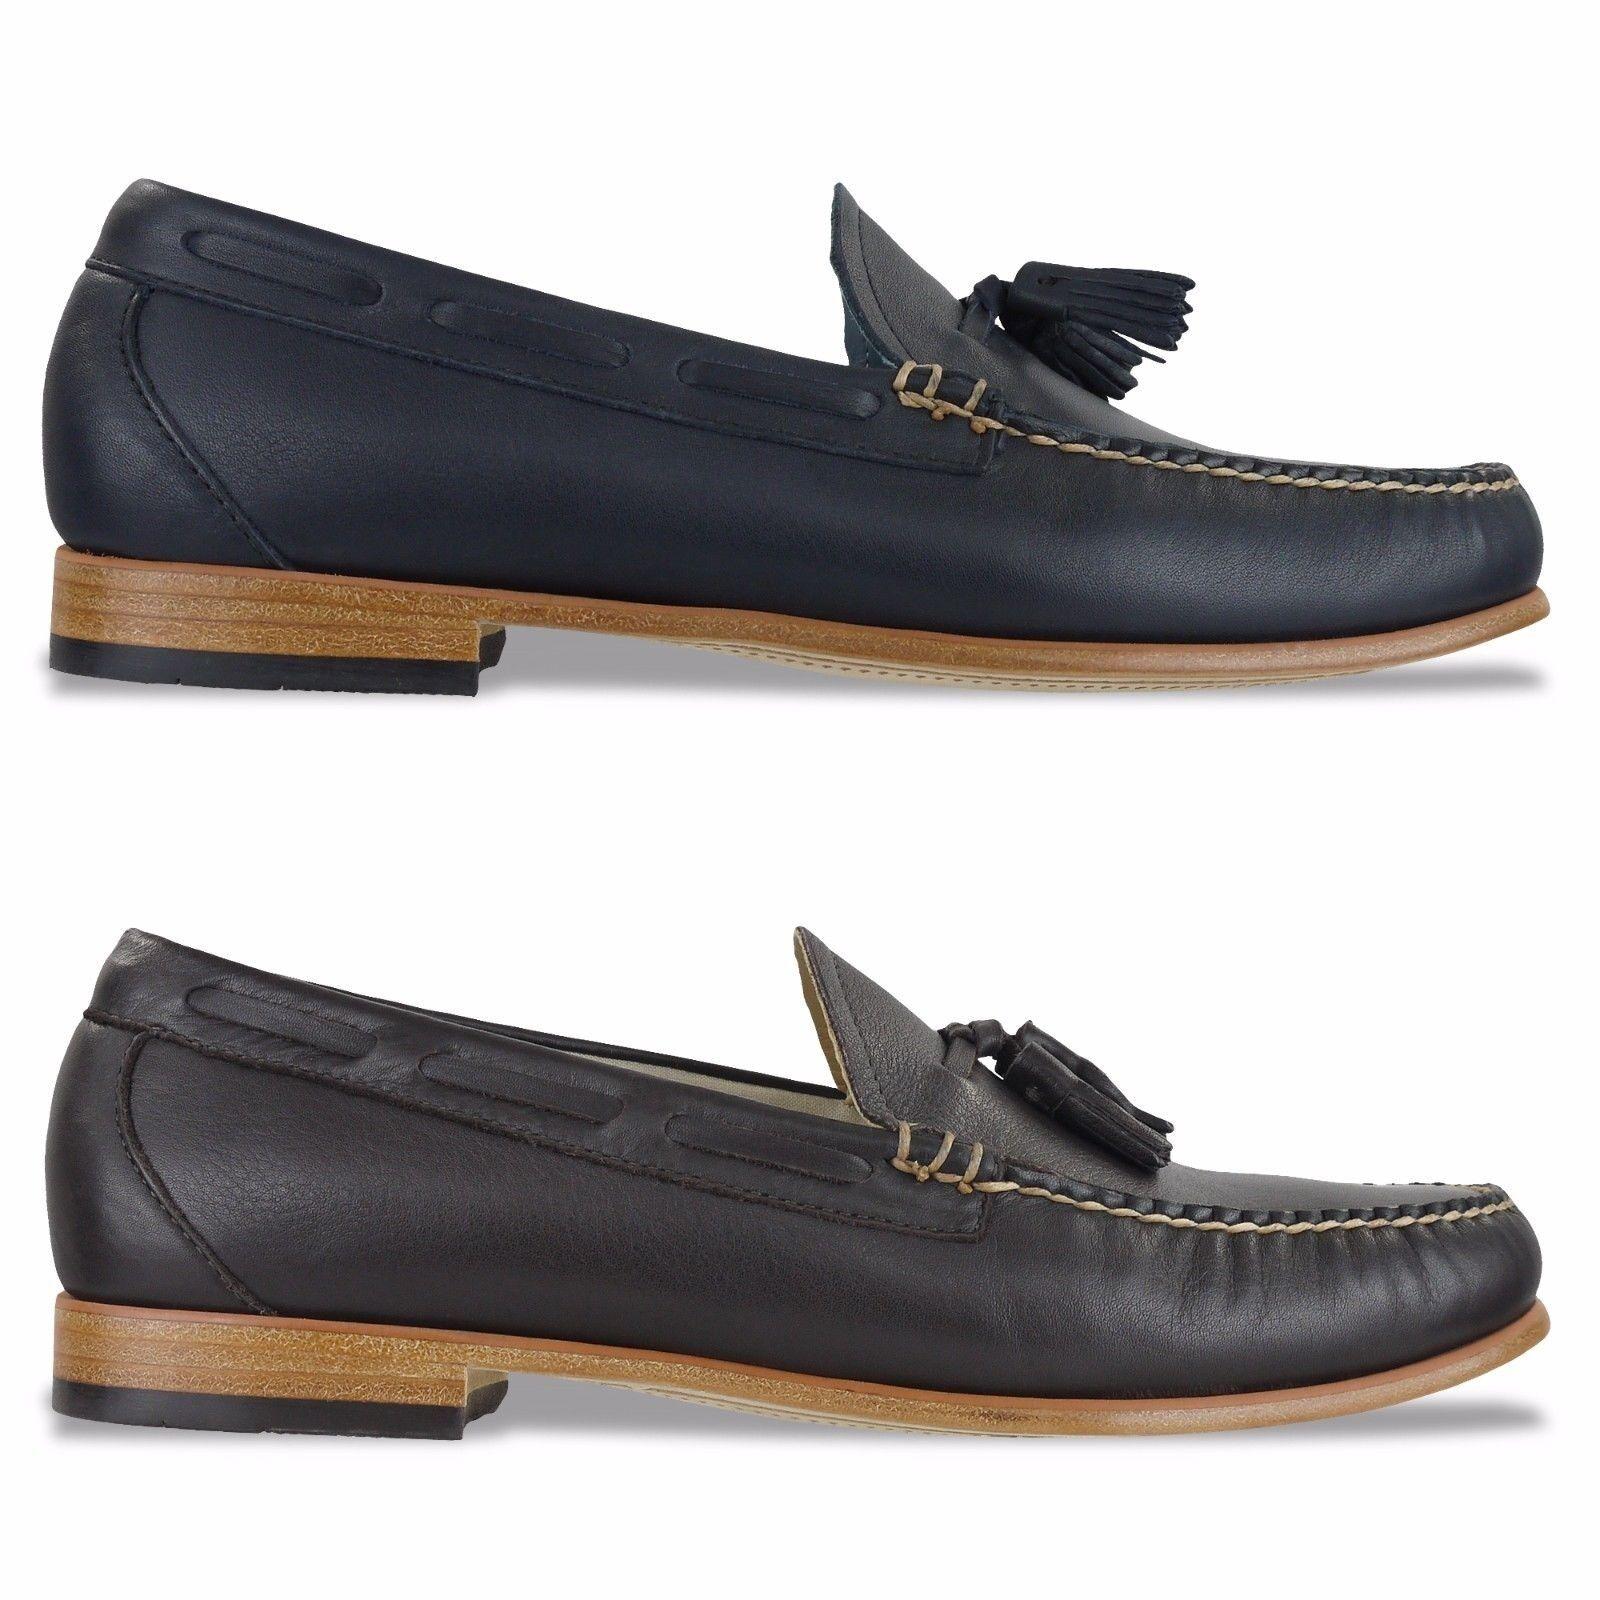 G.H Bass Weejuns Chaussures - Paume Ressorts Larkin Mocassins Cuir - Marine,